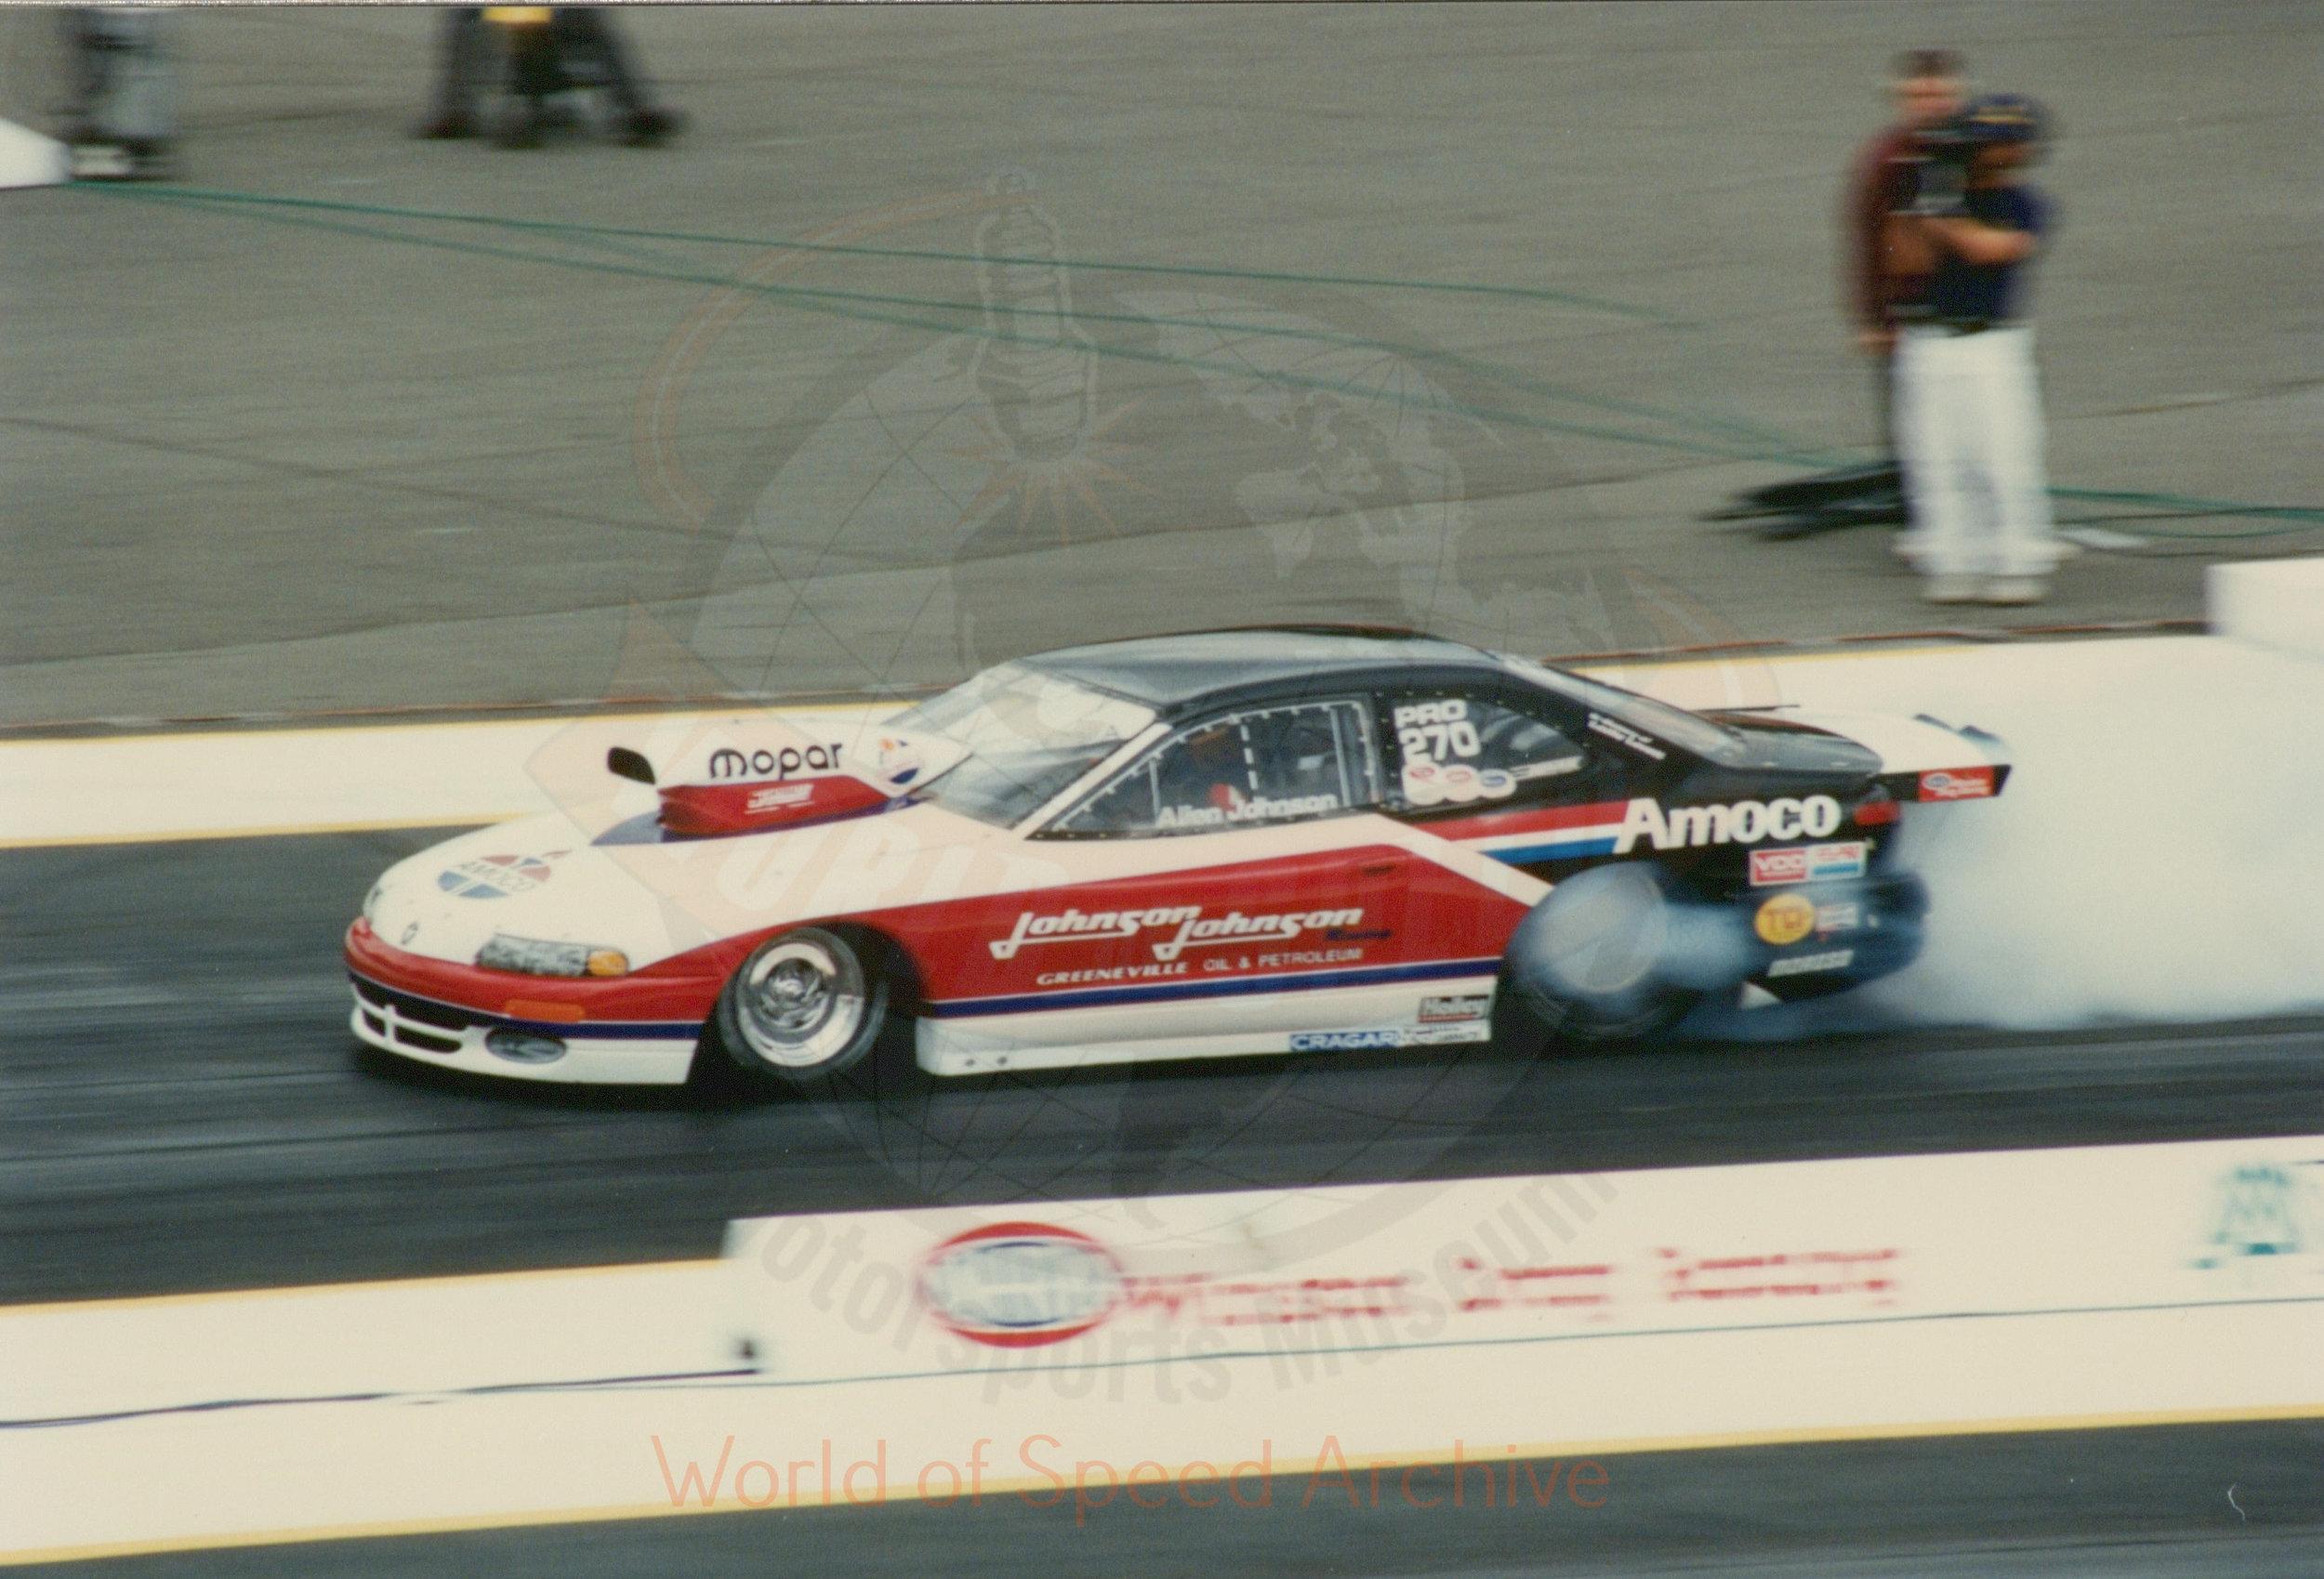 B4-S3-G1-F18-004 - Allen Johnson, Johnson & Johnson Racing, Mopar Amoco